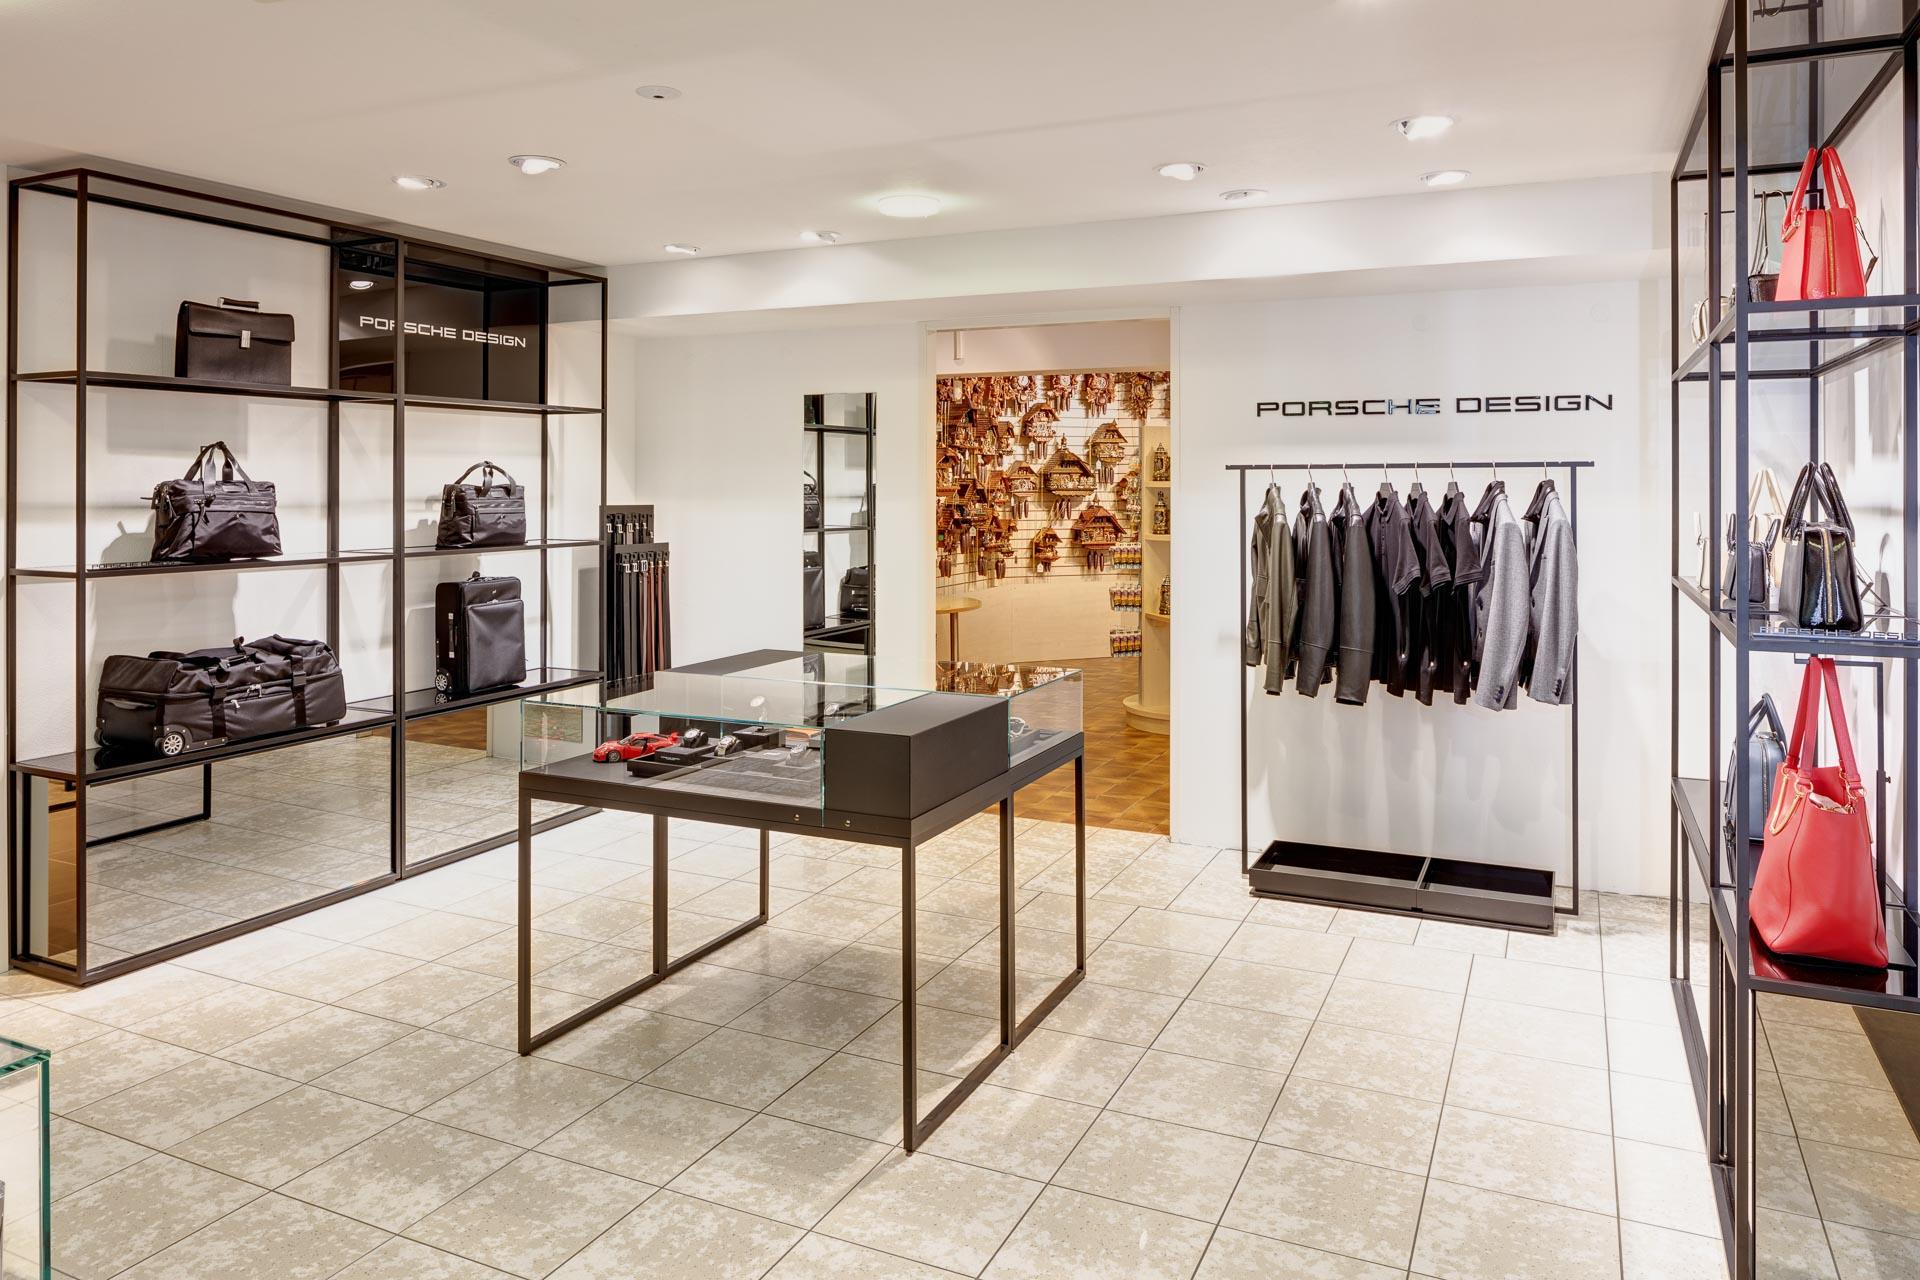 Shopdesign im Schwarzwald. Drubba Shopping, Titisee/Neustadt